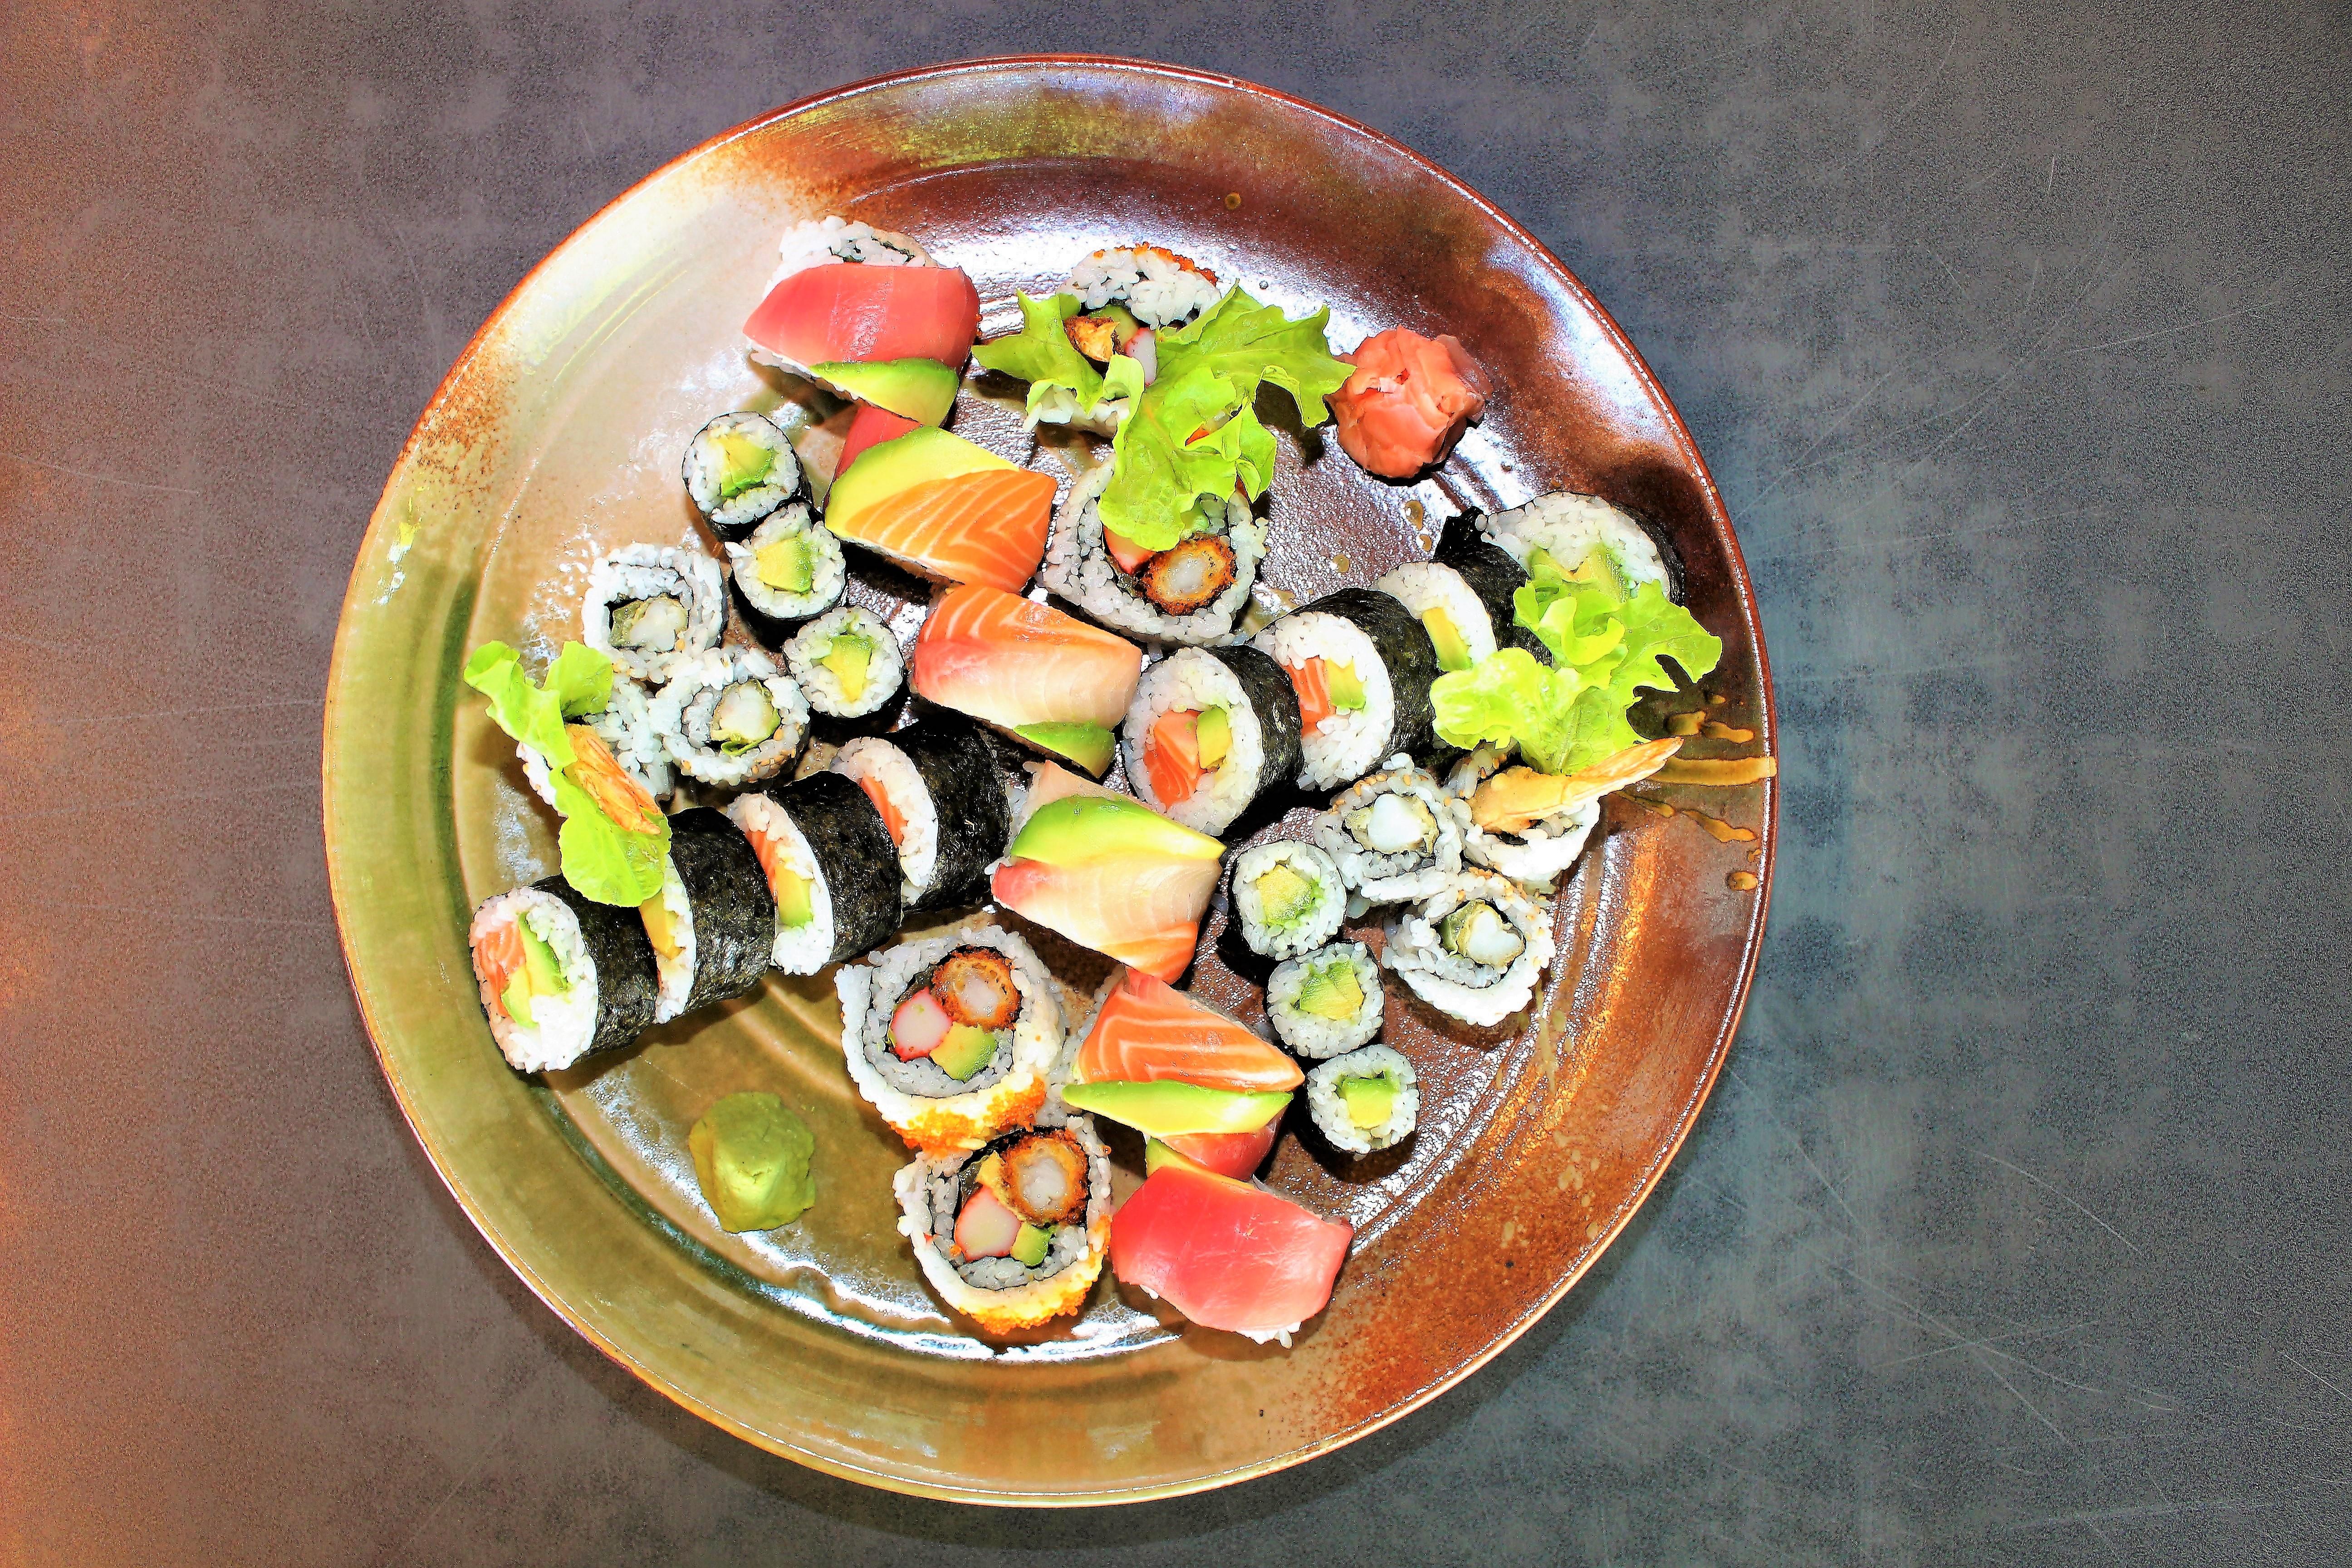 <p>寿司ロールプラッター</p> <p>Sushi Roll Platter $48.00</p>